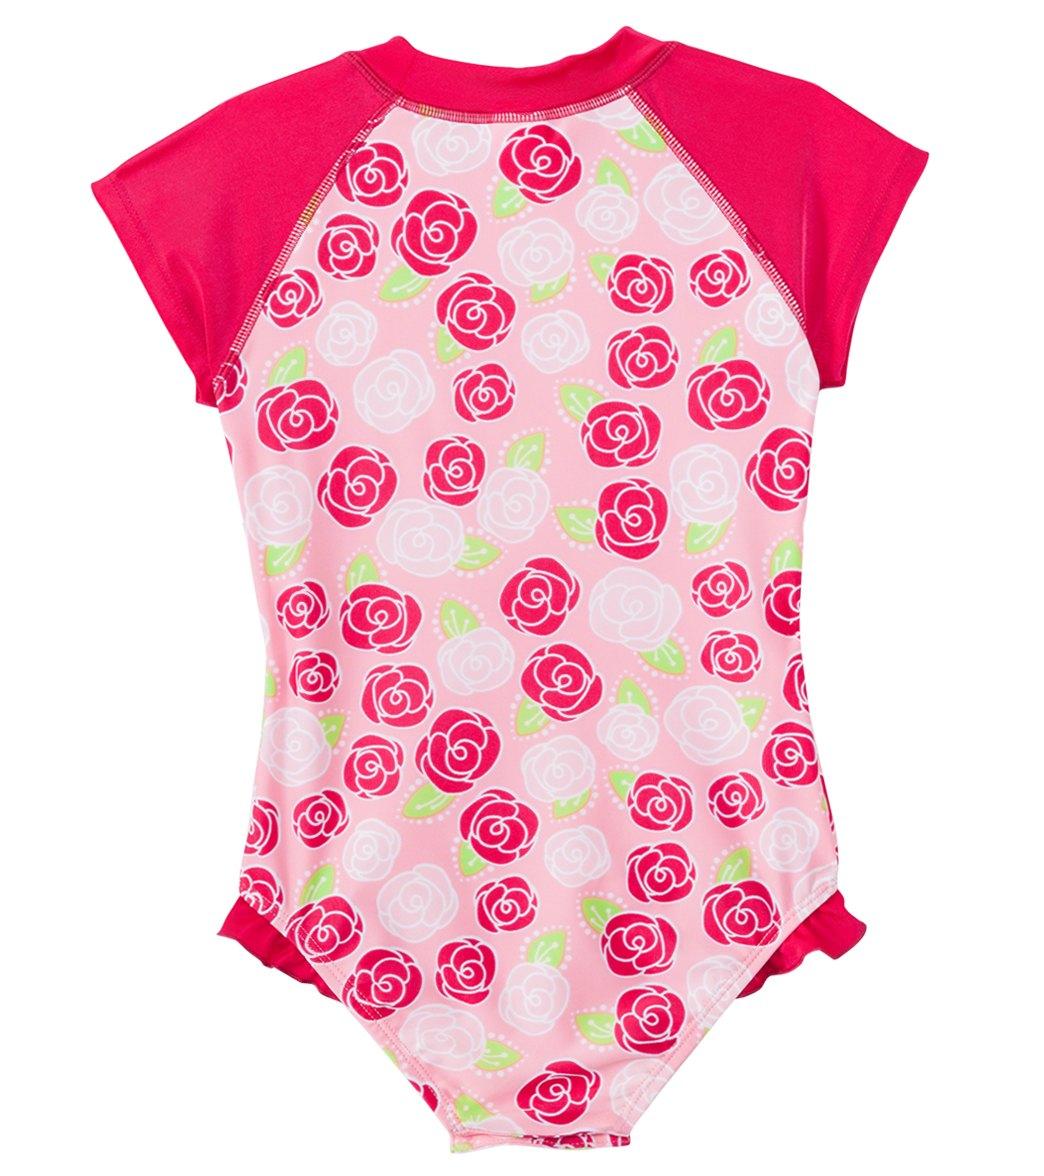 1158d48693f2f SnapMe Girls' Lucy Rosalita Ruffle S/S Rash Guard One Piece Swimsuit UVP 50